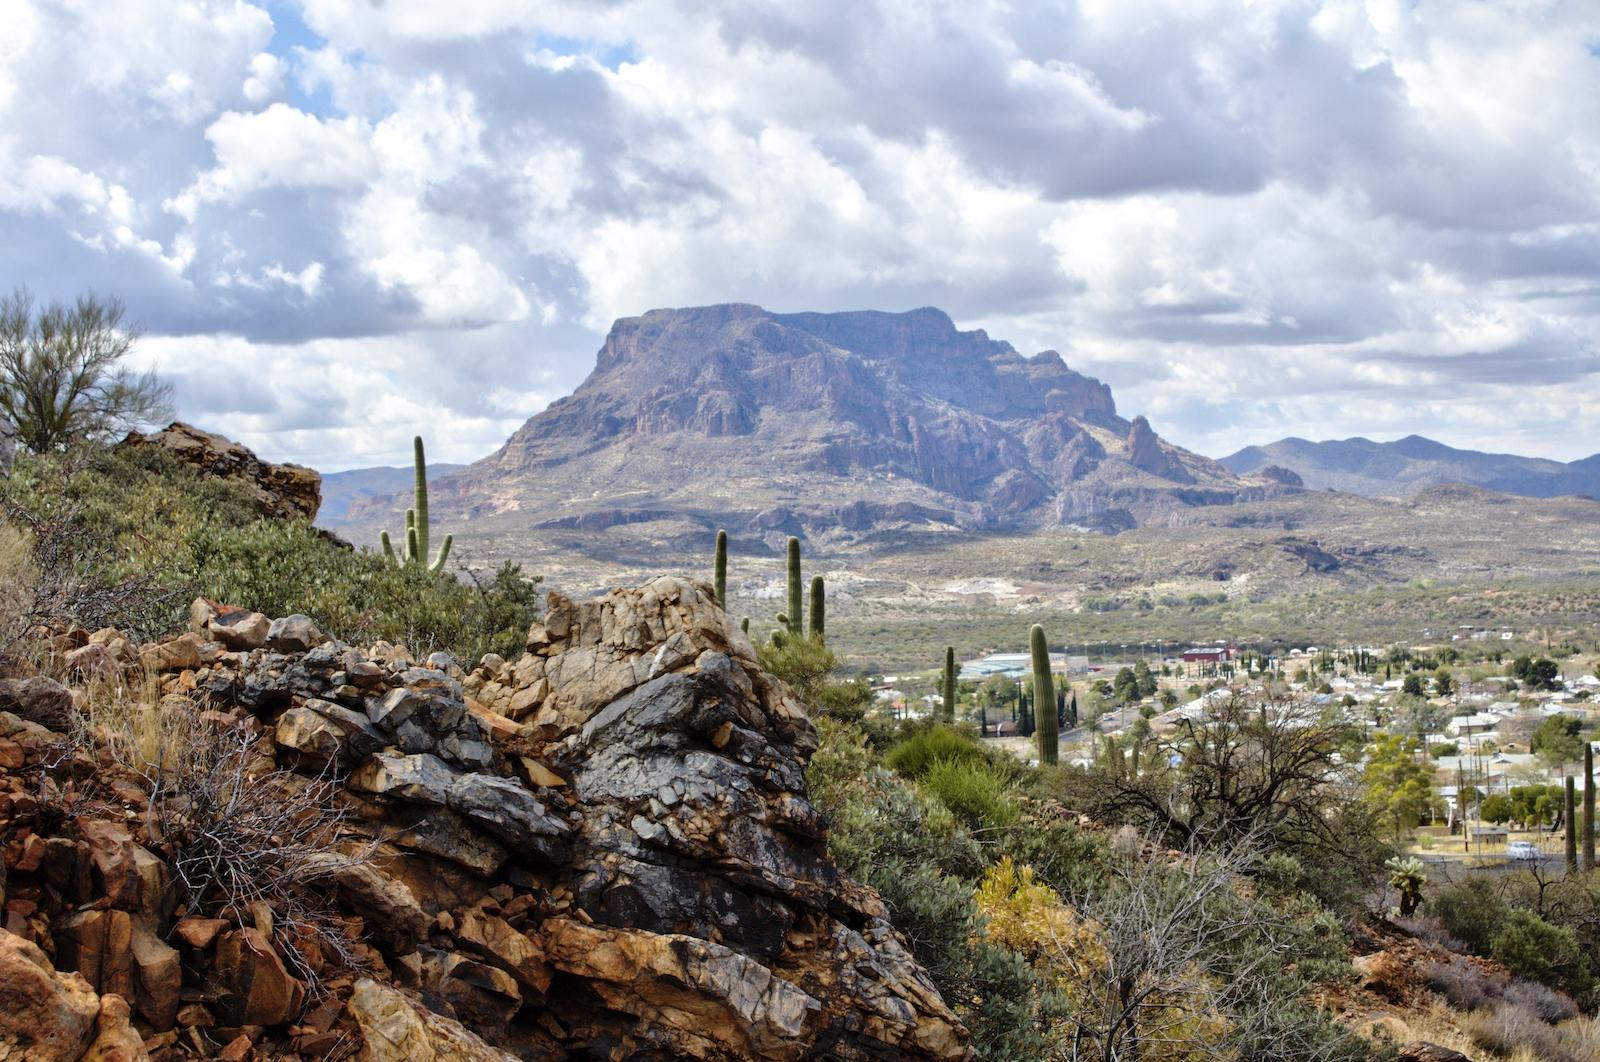 View of Superior, Arizona and Picketpost Mountain